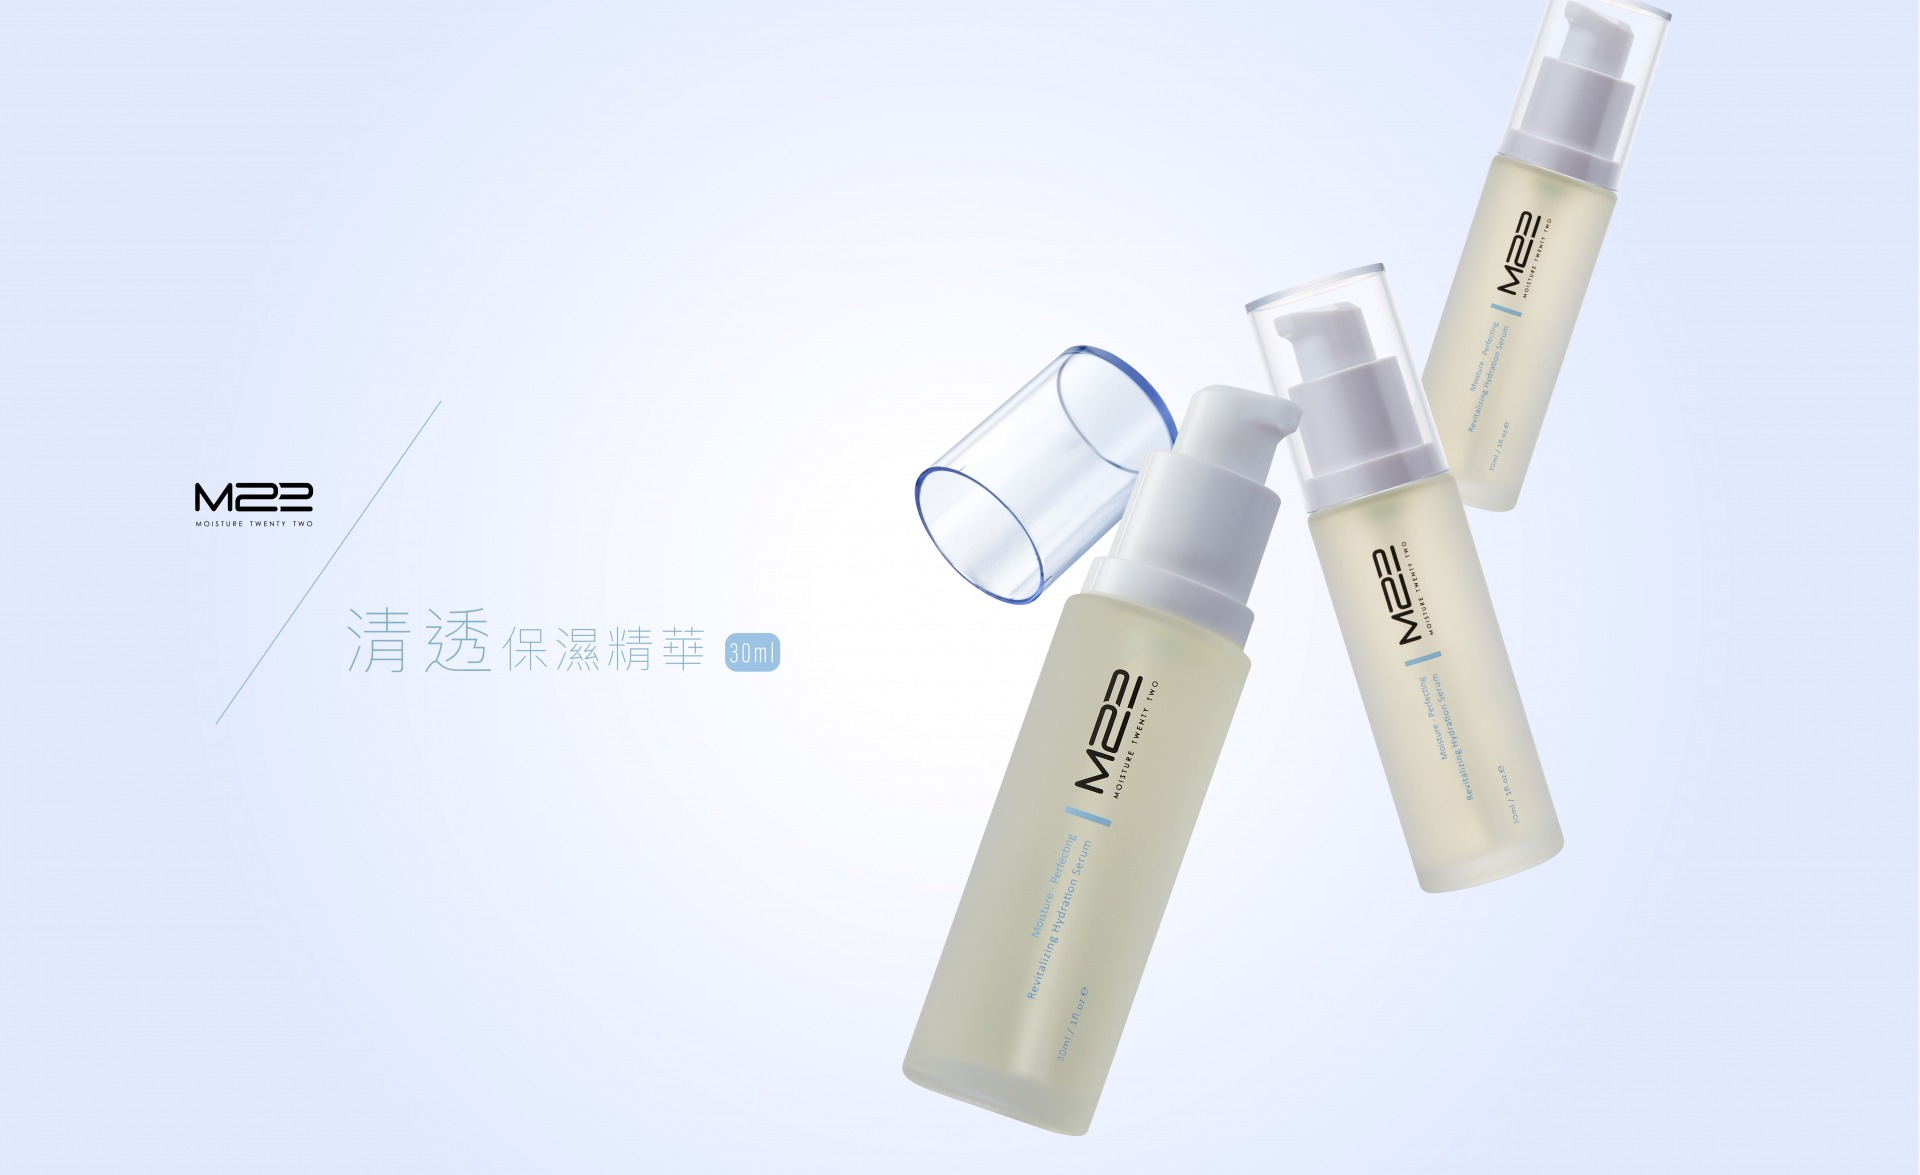 M22_v2_Products清透保濕_清透保濕精華V2_index